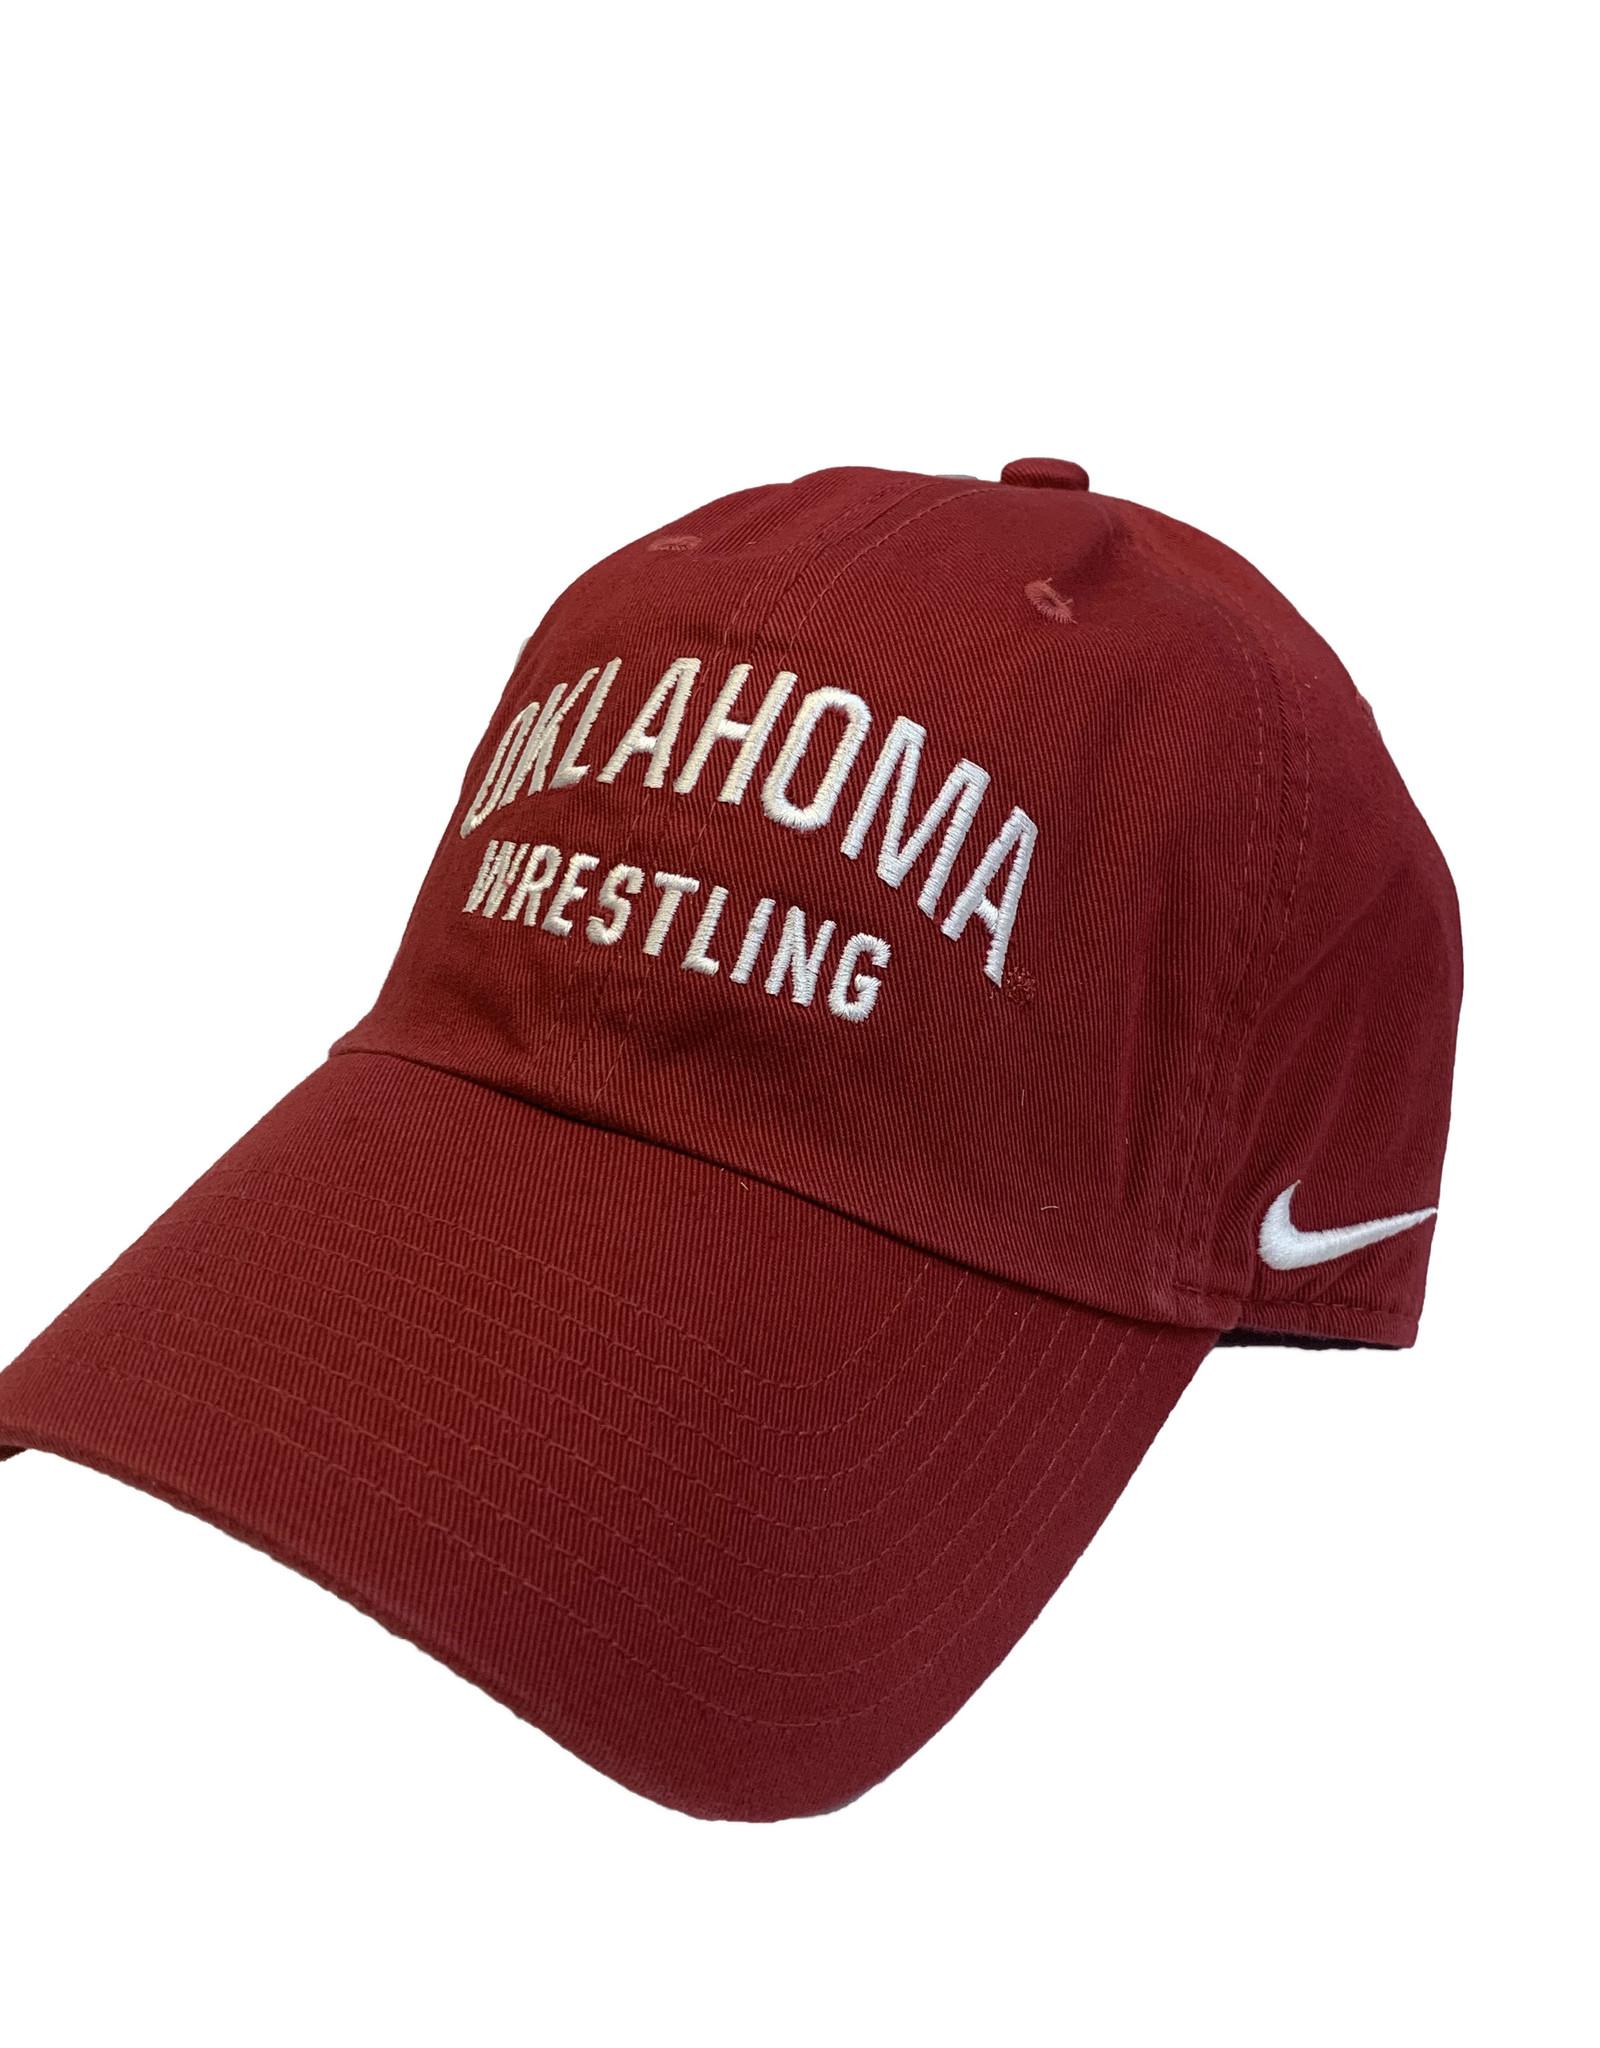 Nike Nike Oklahoma Wrestling Campus Cap Crimson